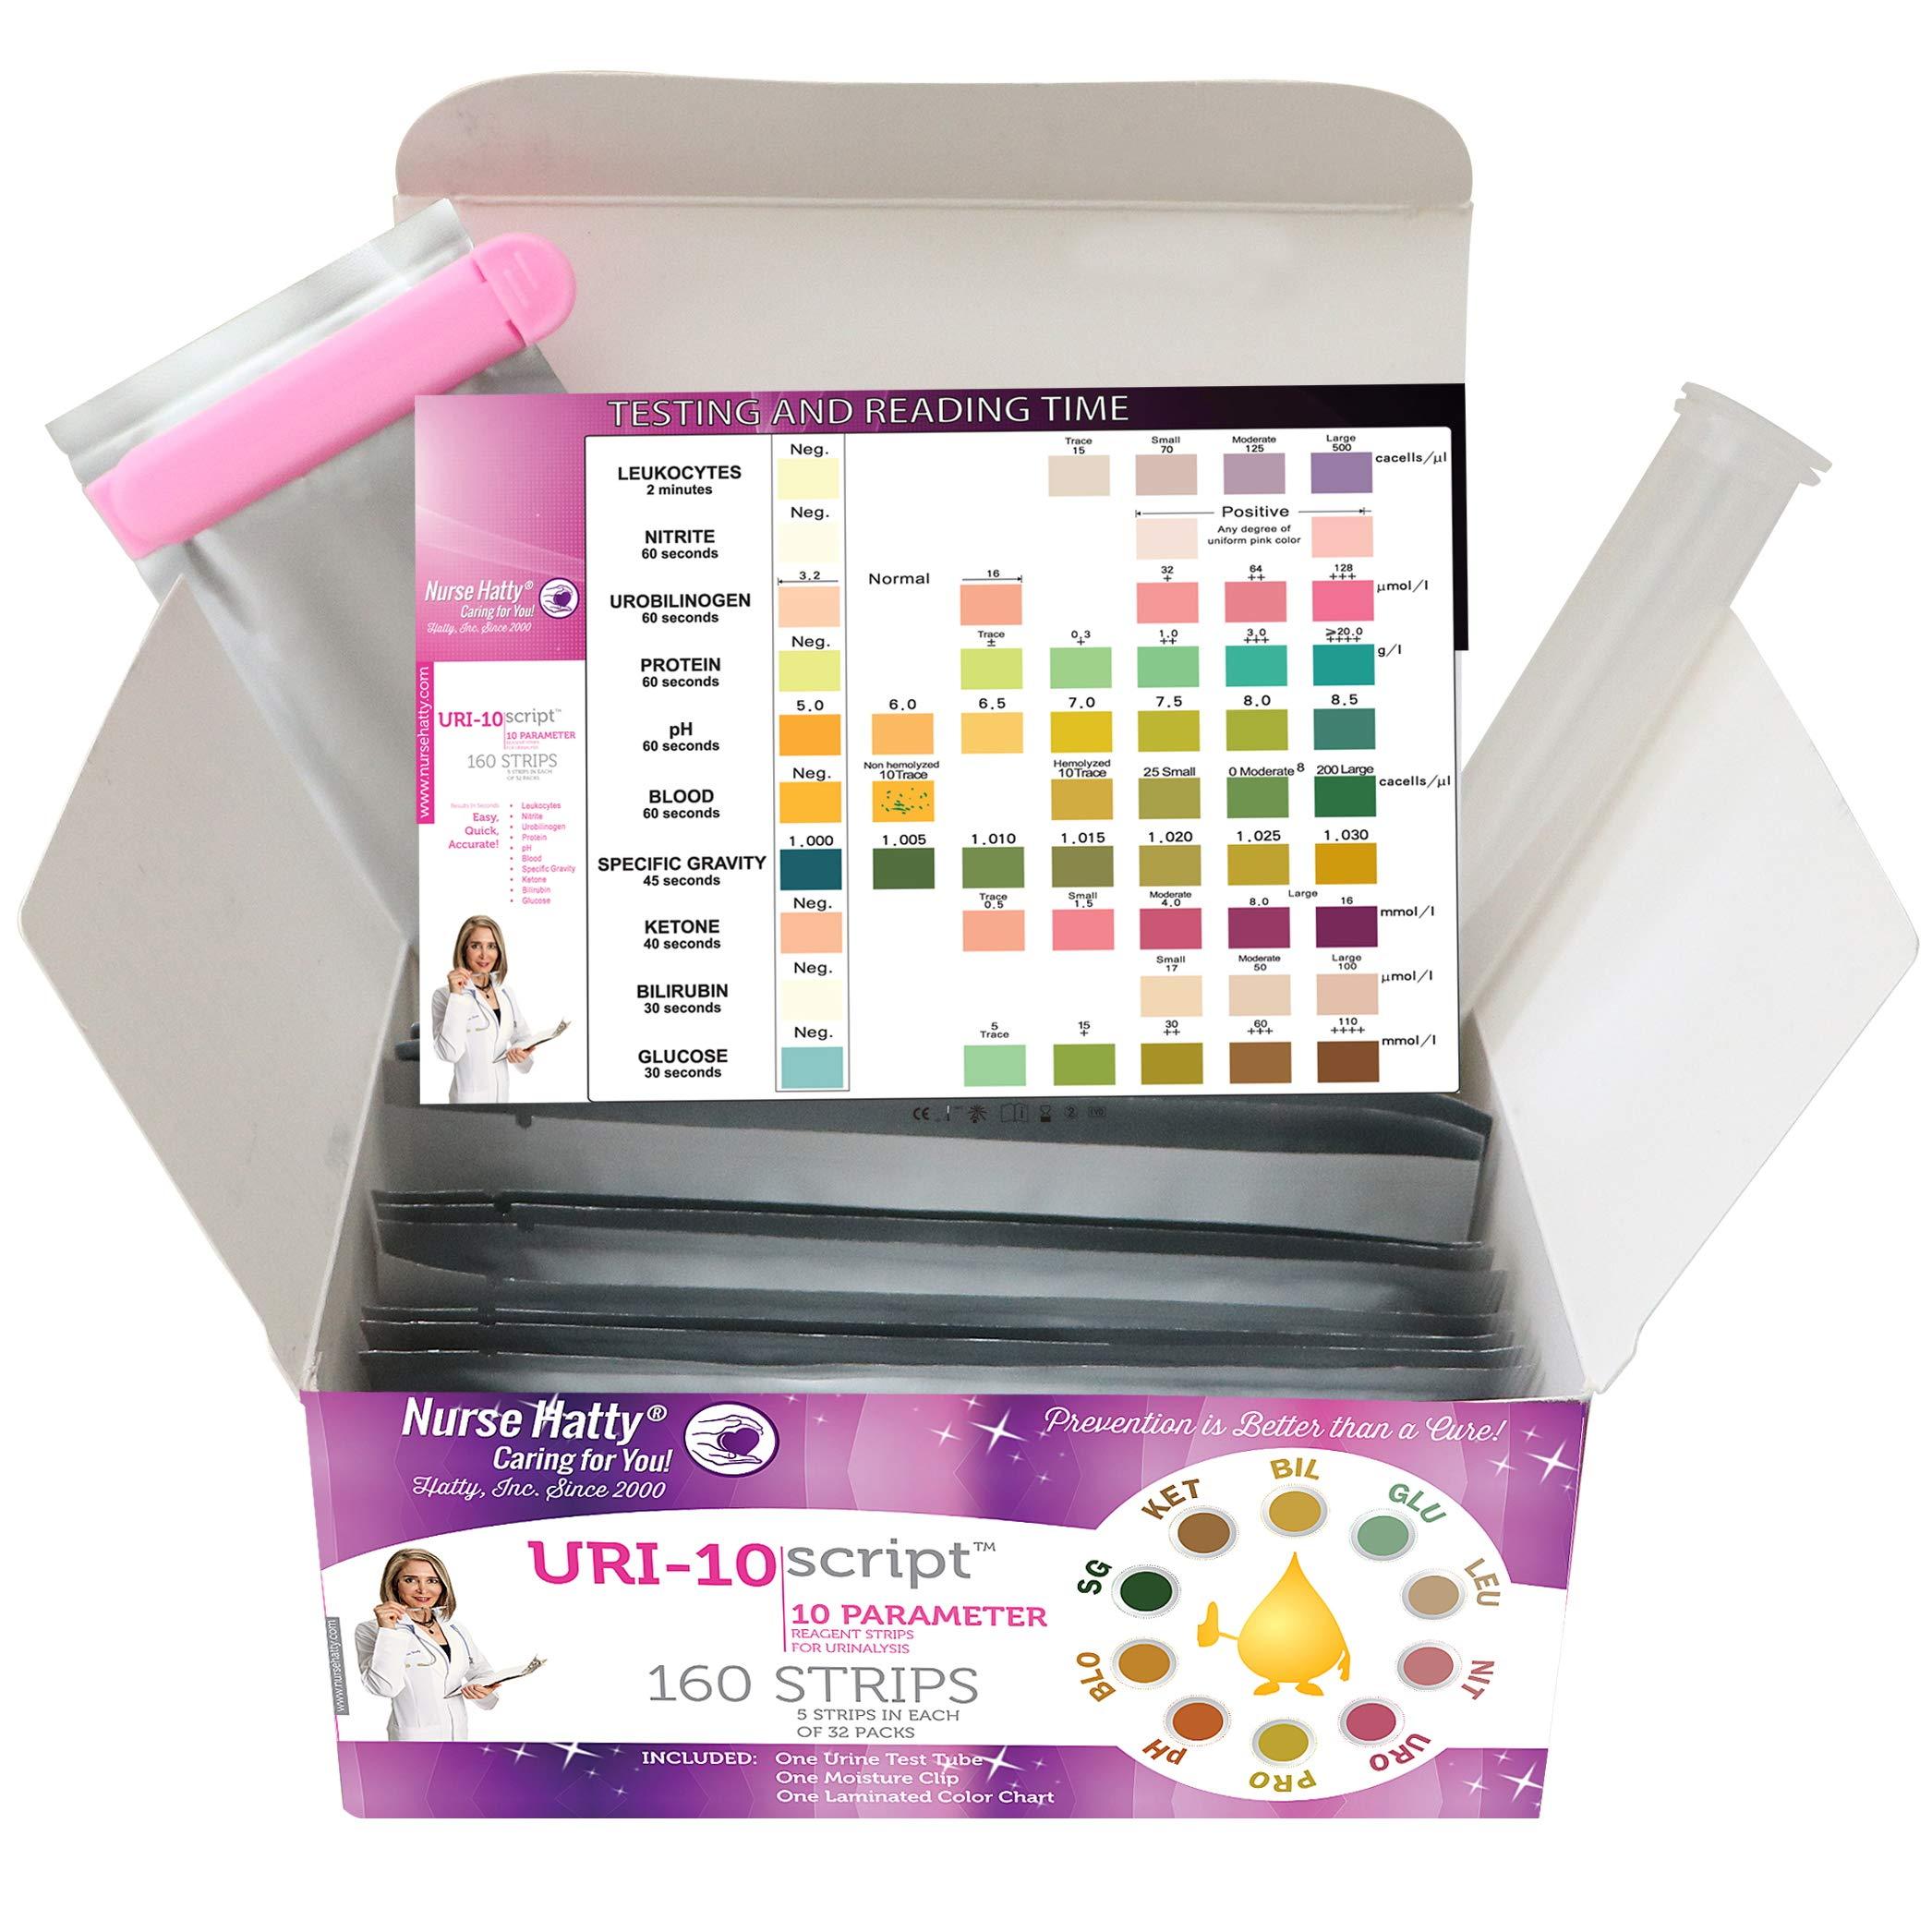 Nurse Hatty – 160 ct. Box - 10 Parameter Urine Test Strips (5ct. X 32 Packs) for UTI, Gallbladder, Kidney Health, Ketone, pH, Protein, Blood & More! Test Tube, Moisture Clip & Waterproof Chart Inc.